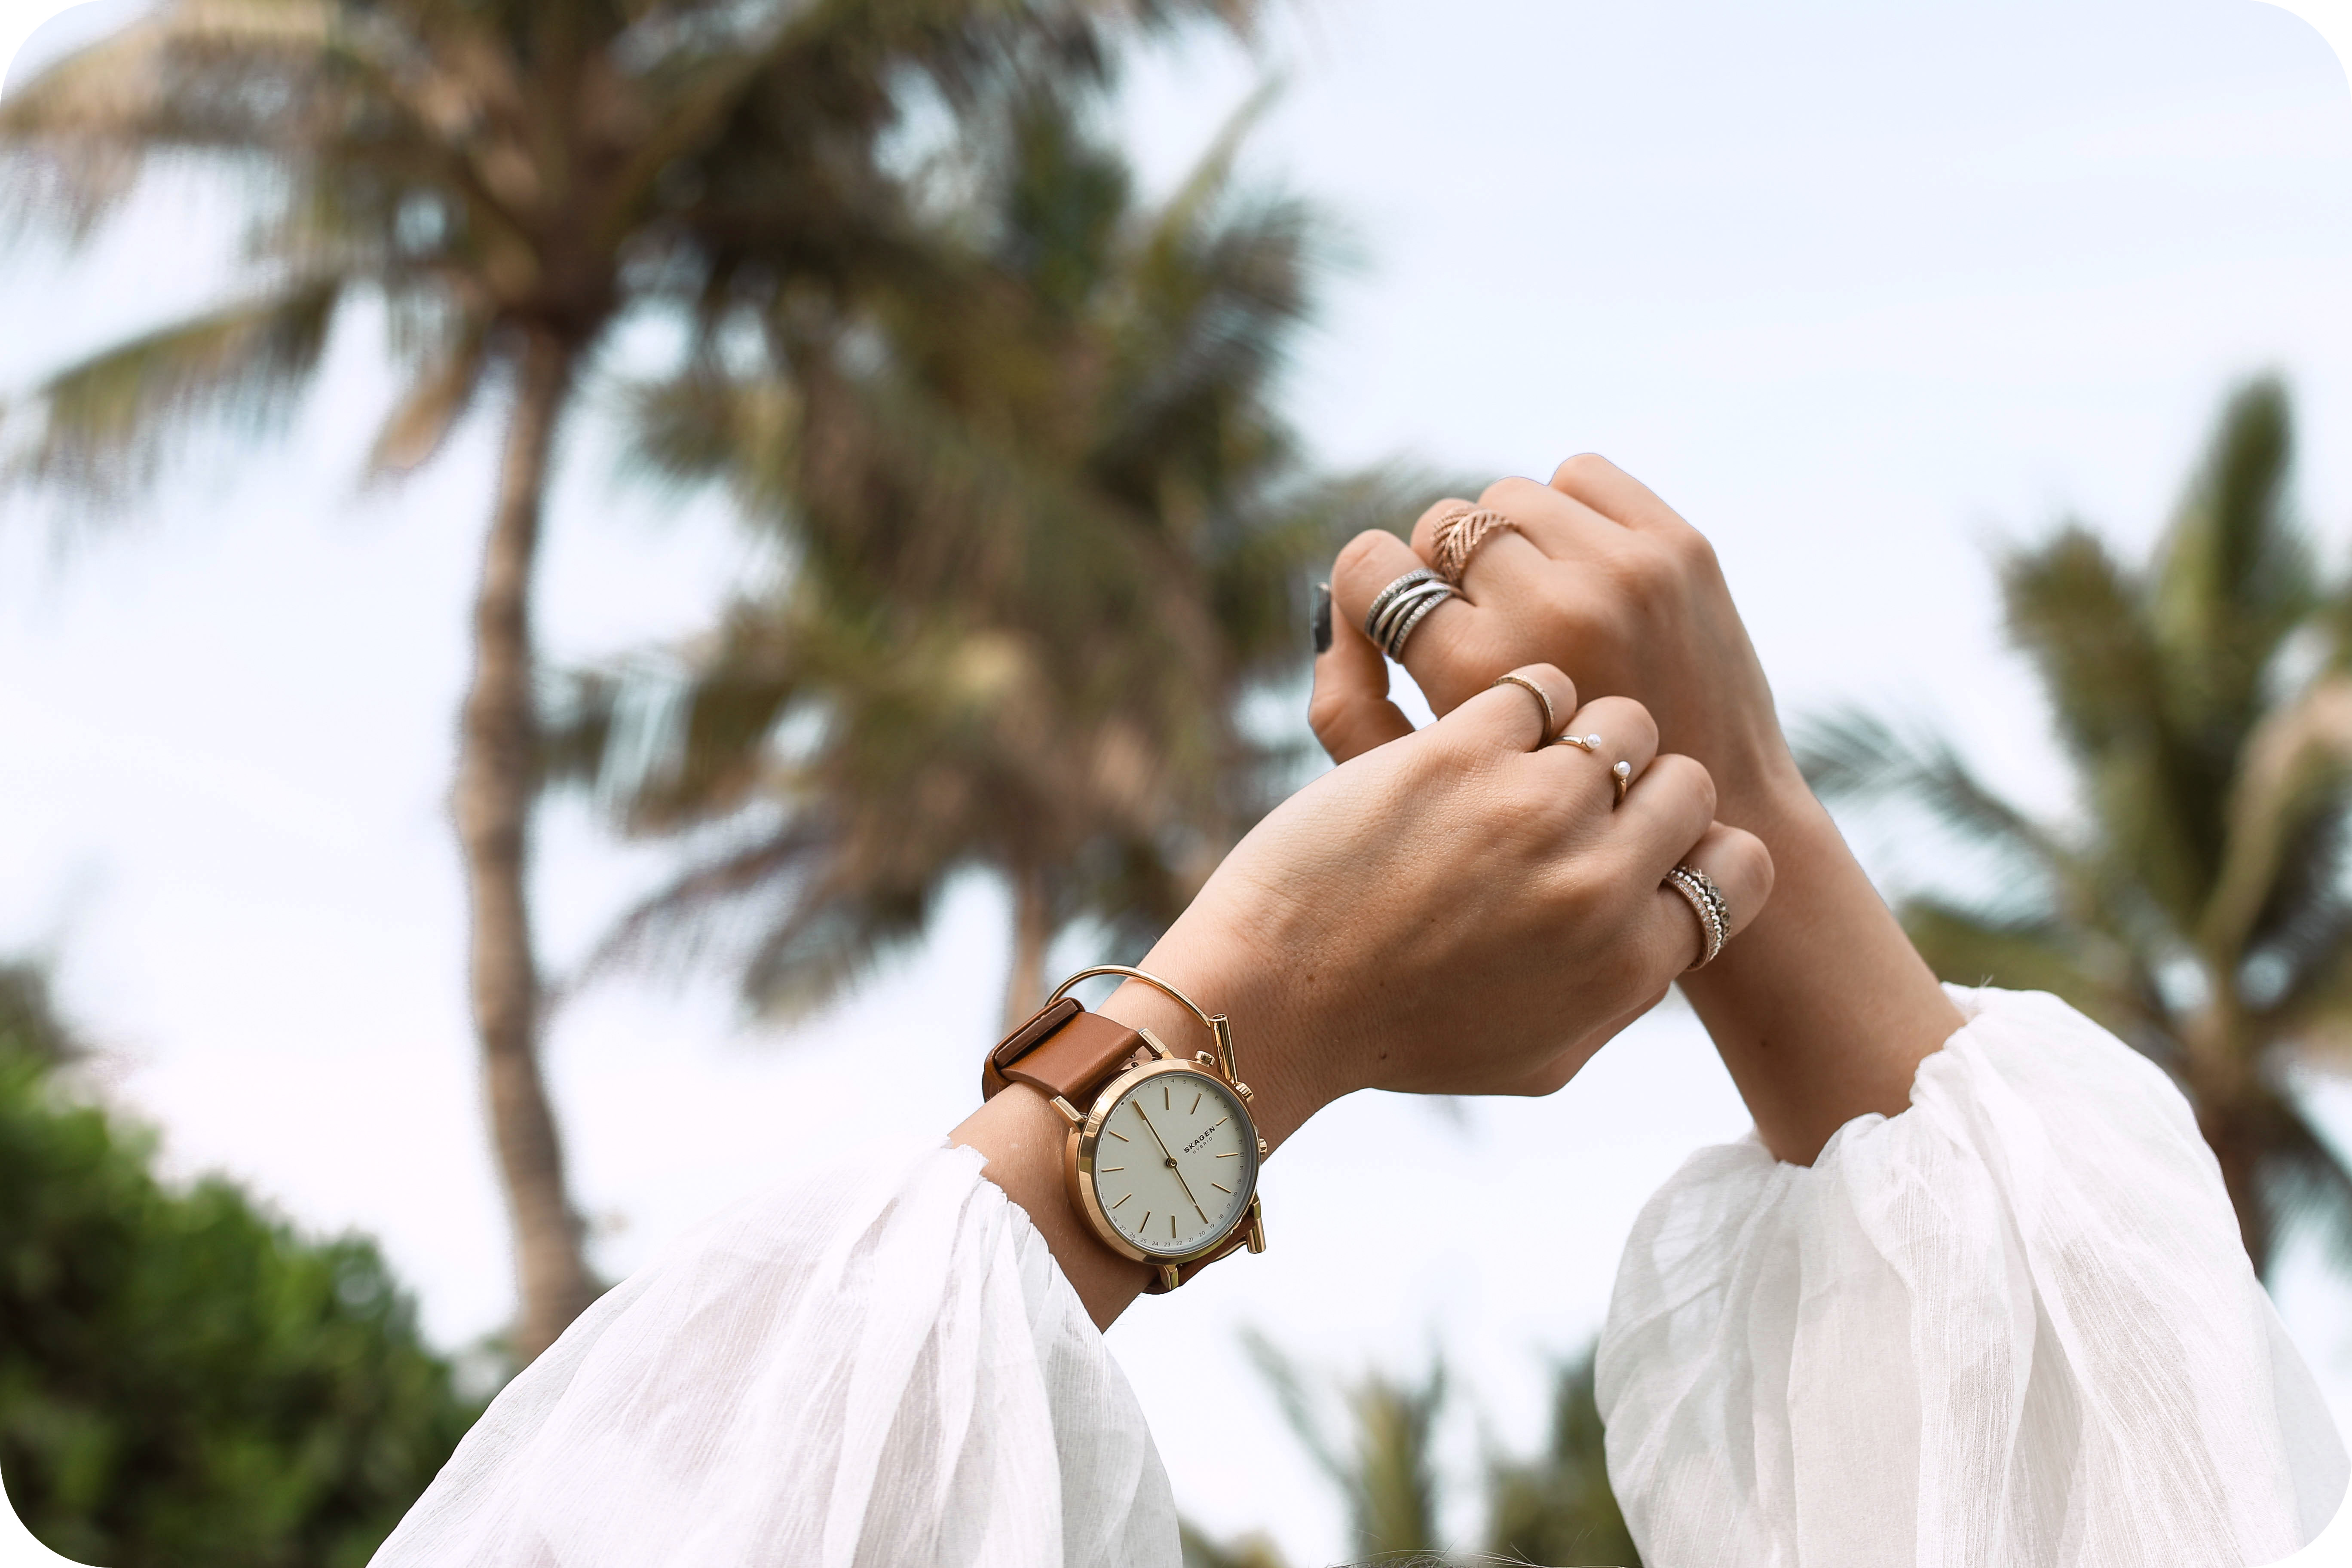 skagen hybrid smartwatch palm trees dubai skagen connected review